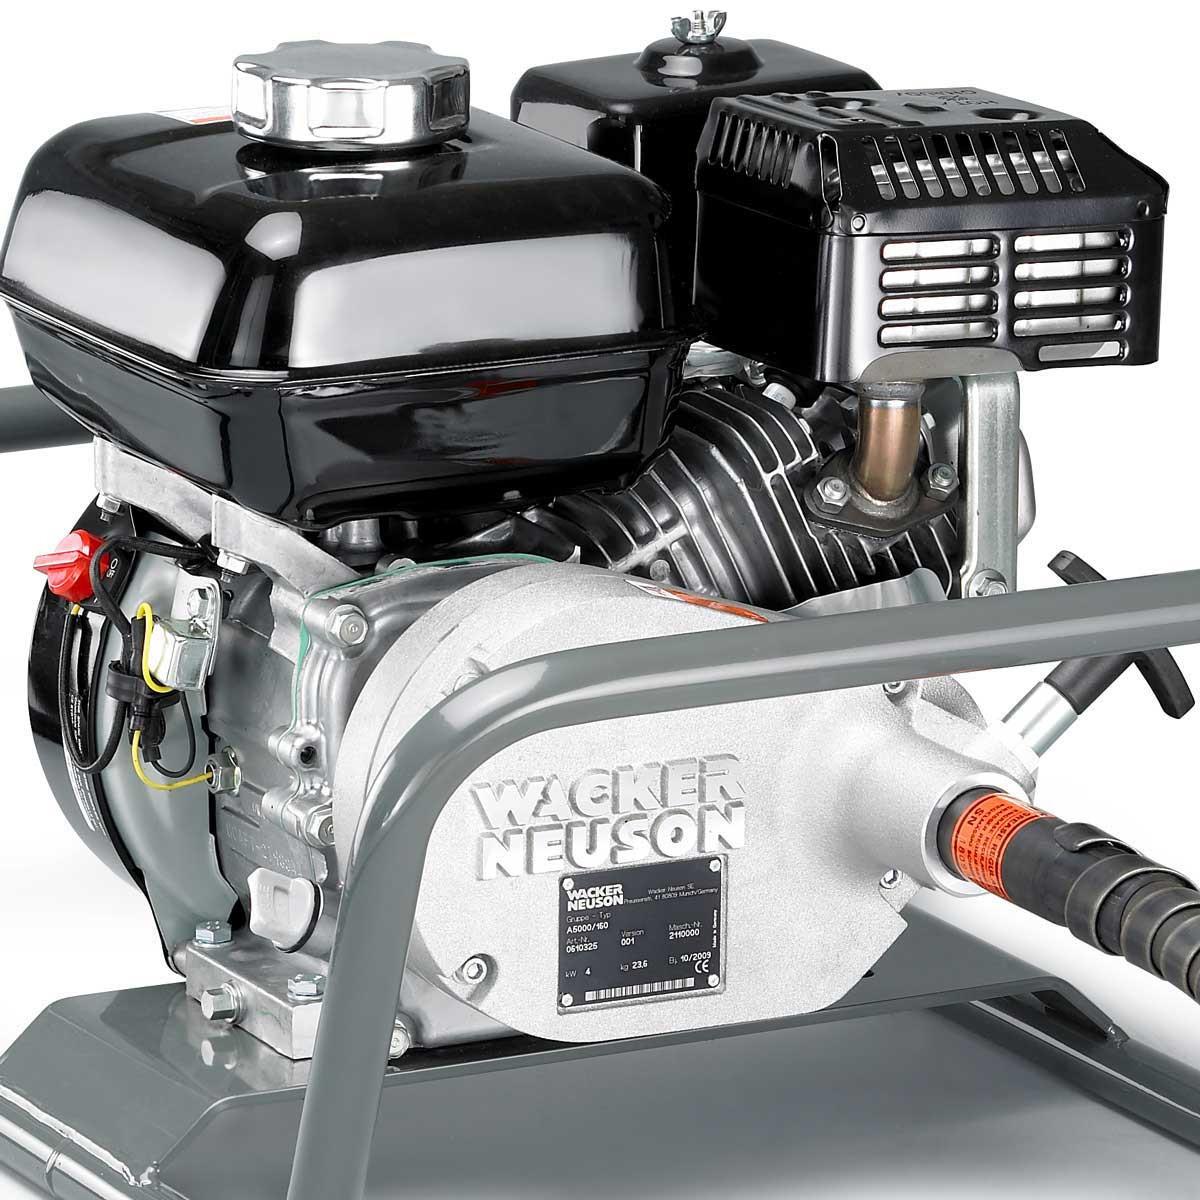 Wacker Neuson A5000 Concrete Vibrator Honda gas engine